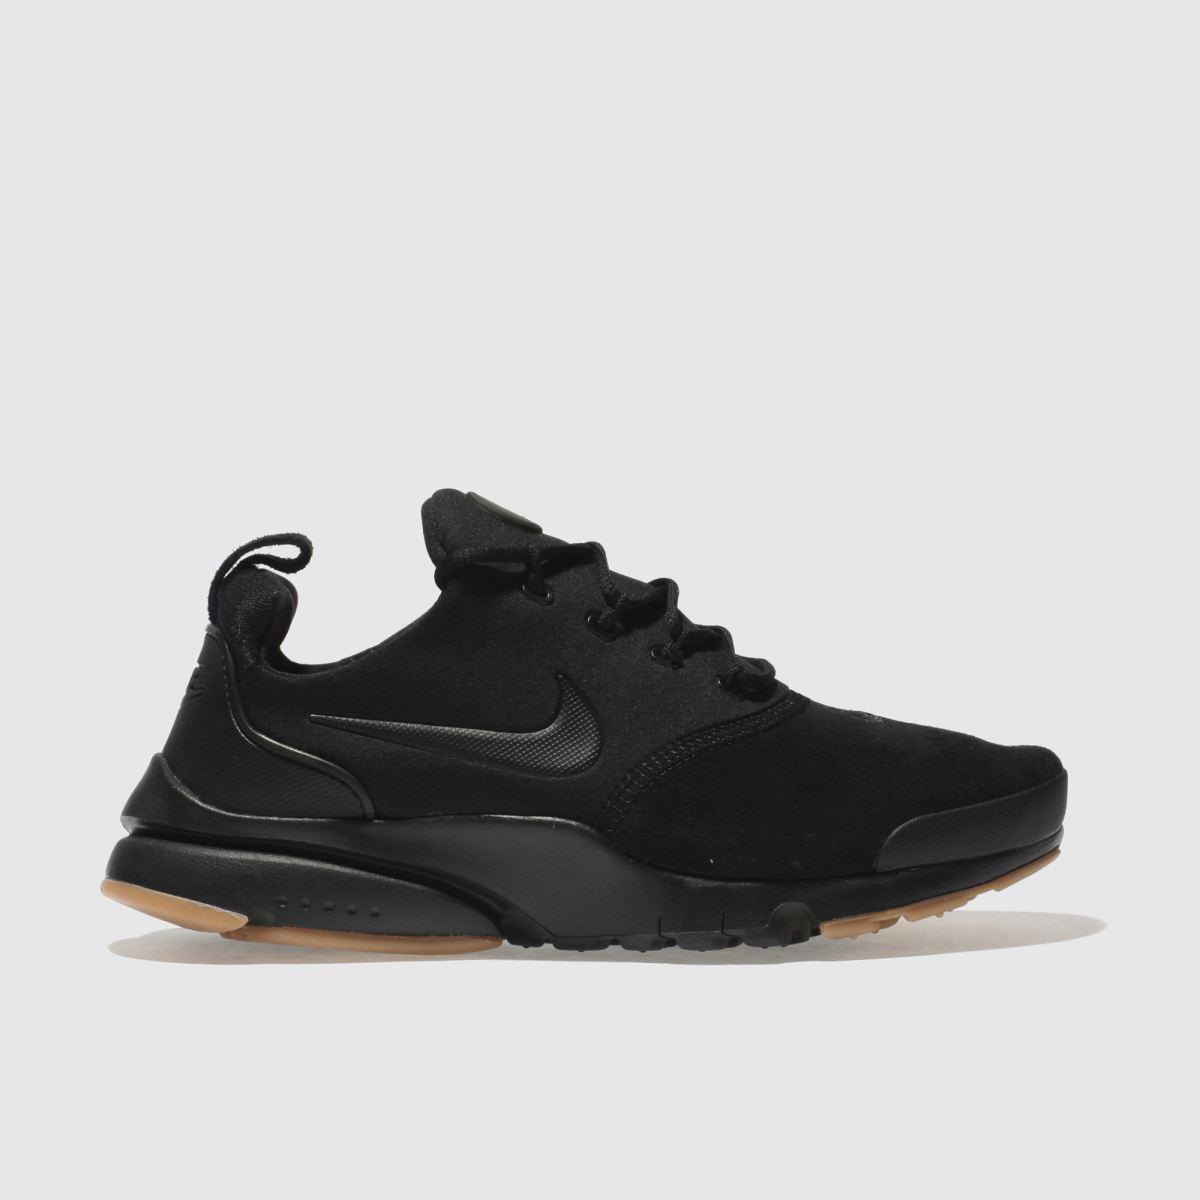 Nike Black Presto Fly Premium Trainers Youth